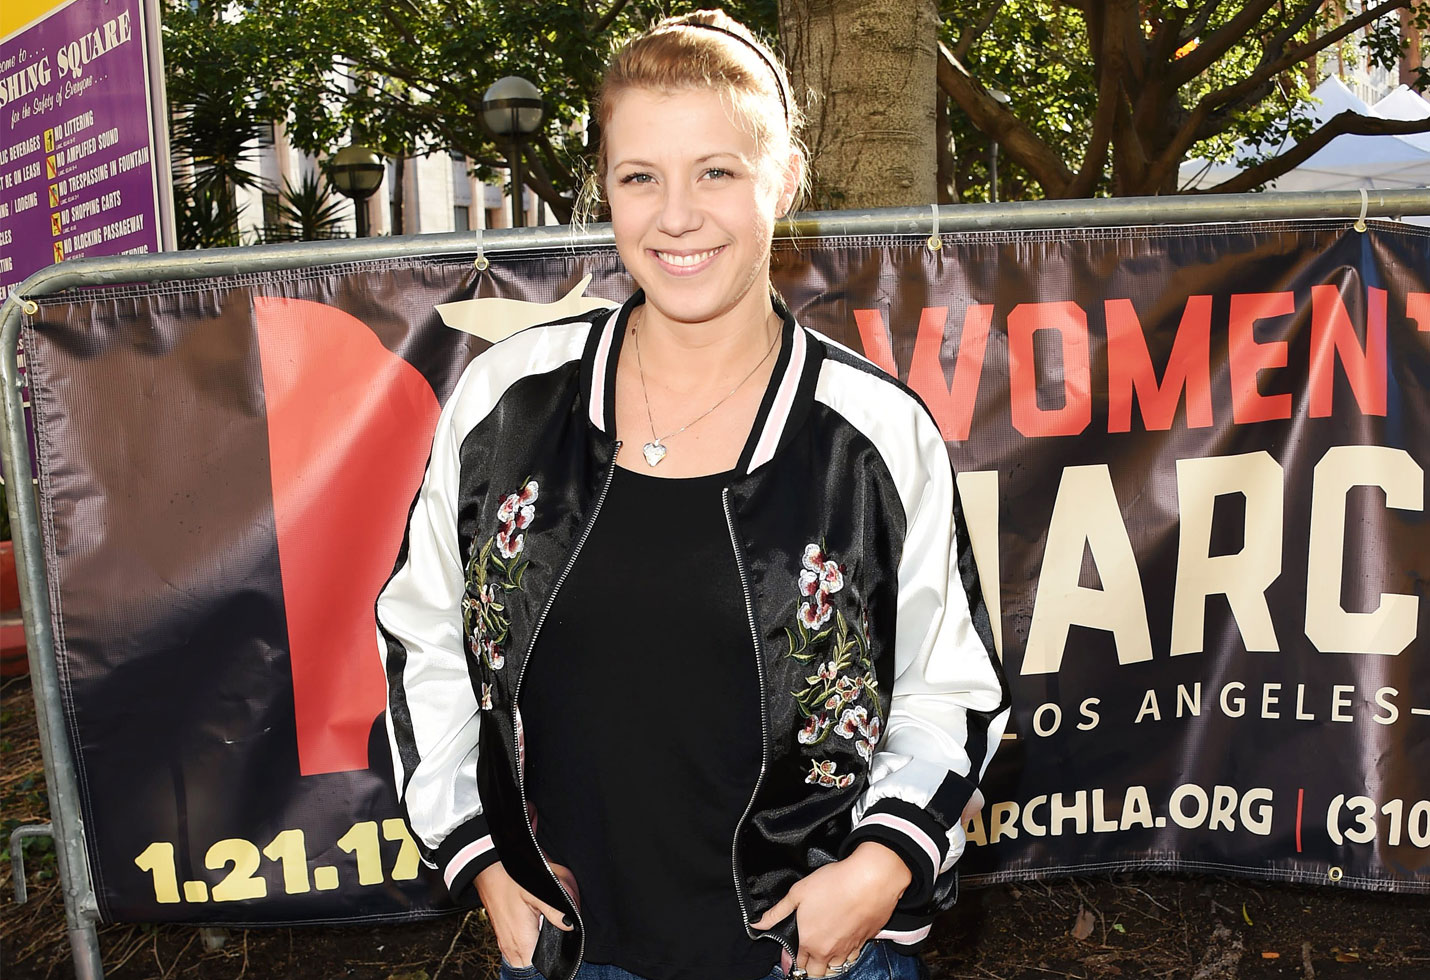 Jodie sweetin sexual assault fuller house kavanaugh